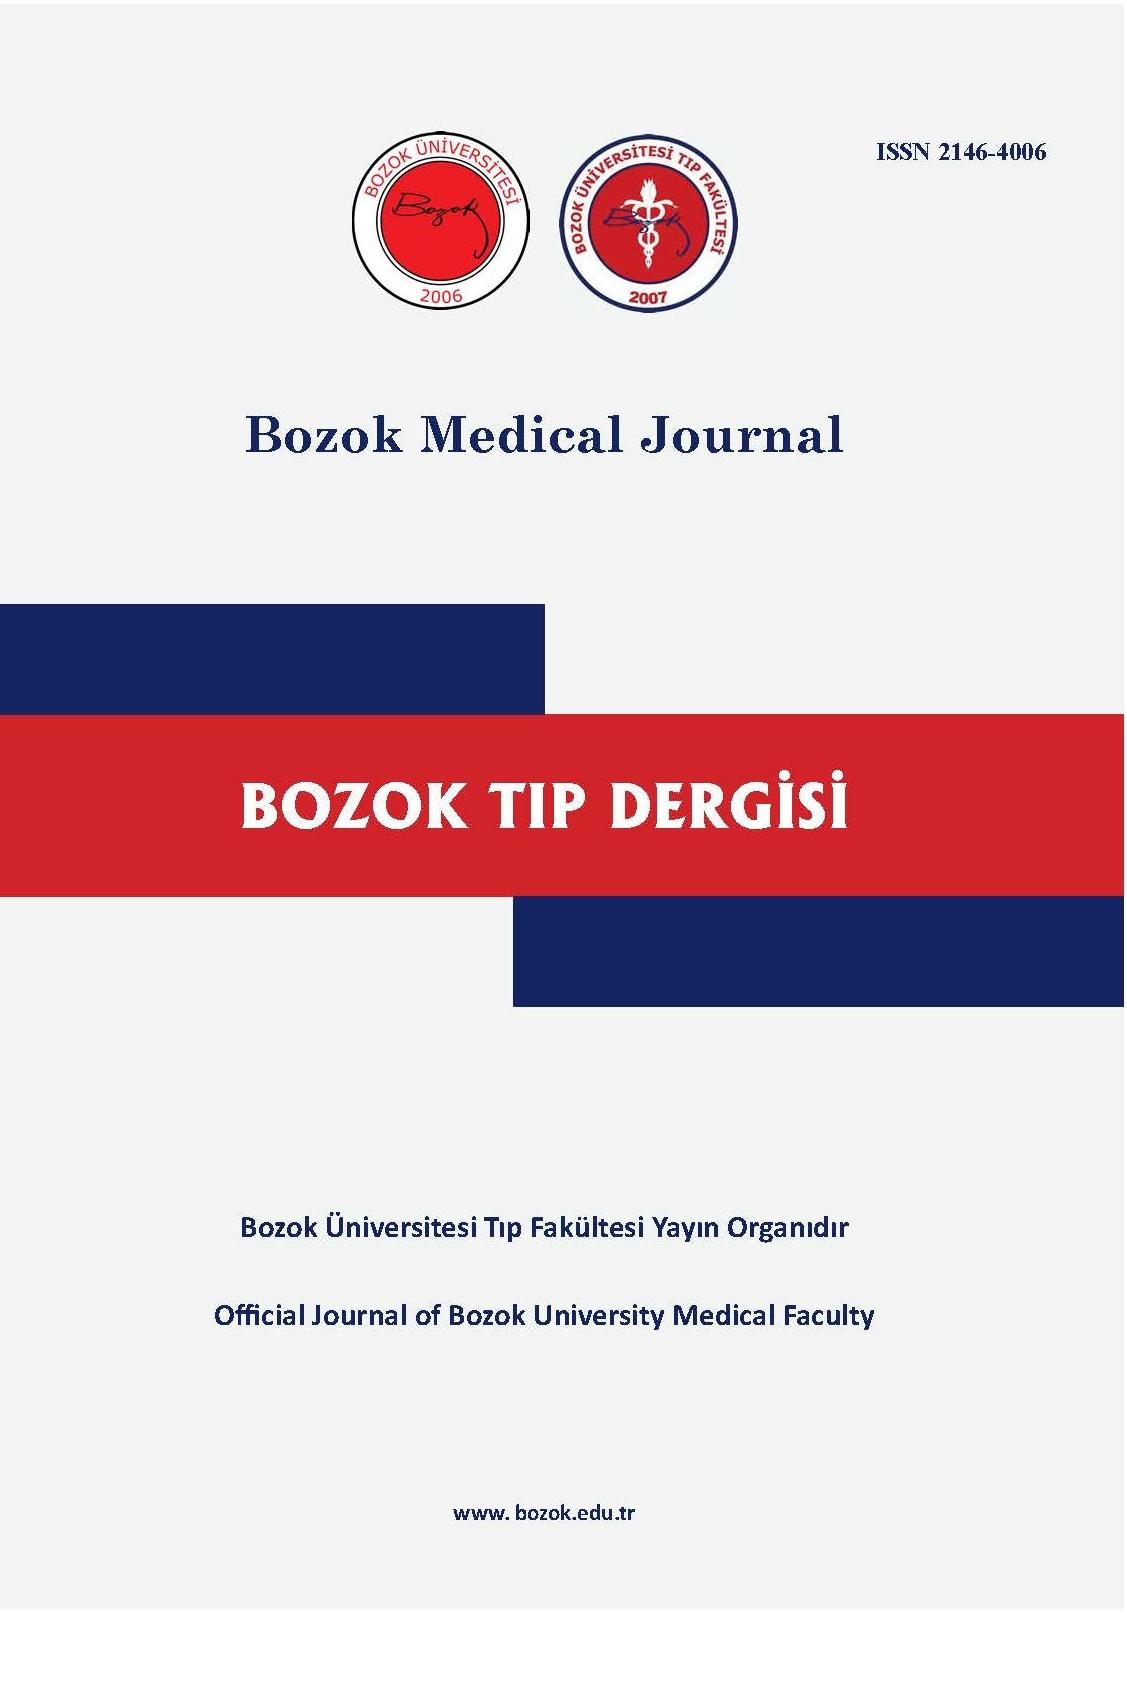 Bozok Medical Journal